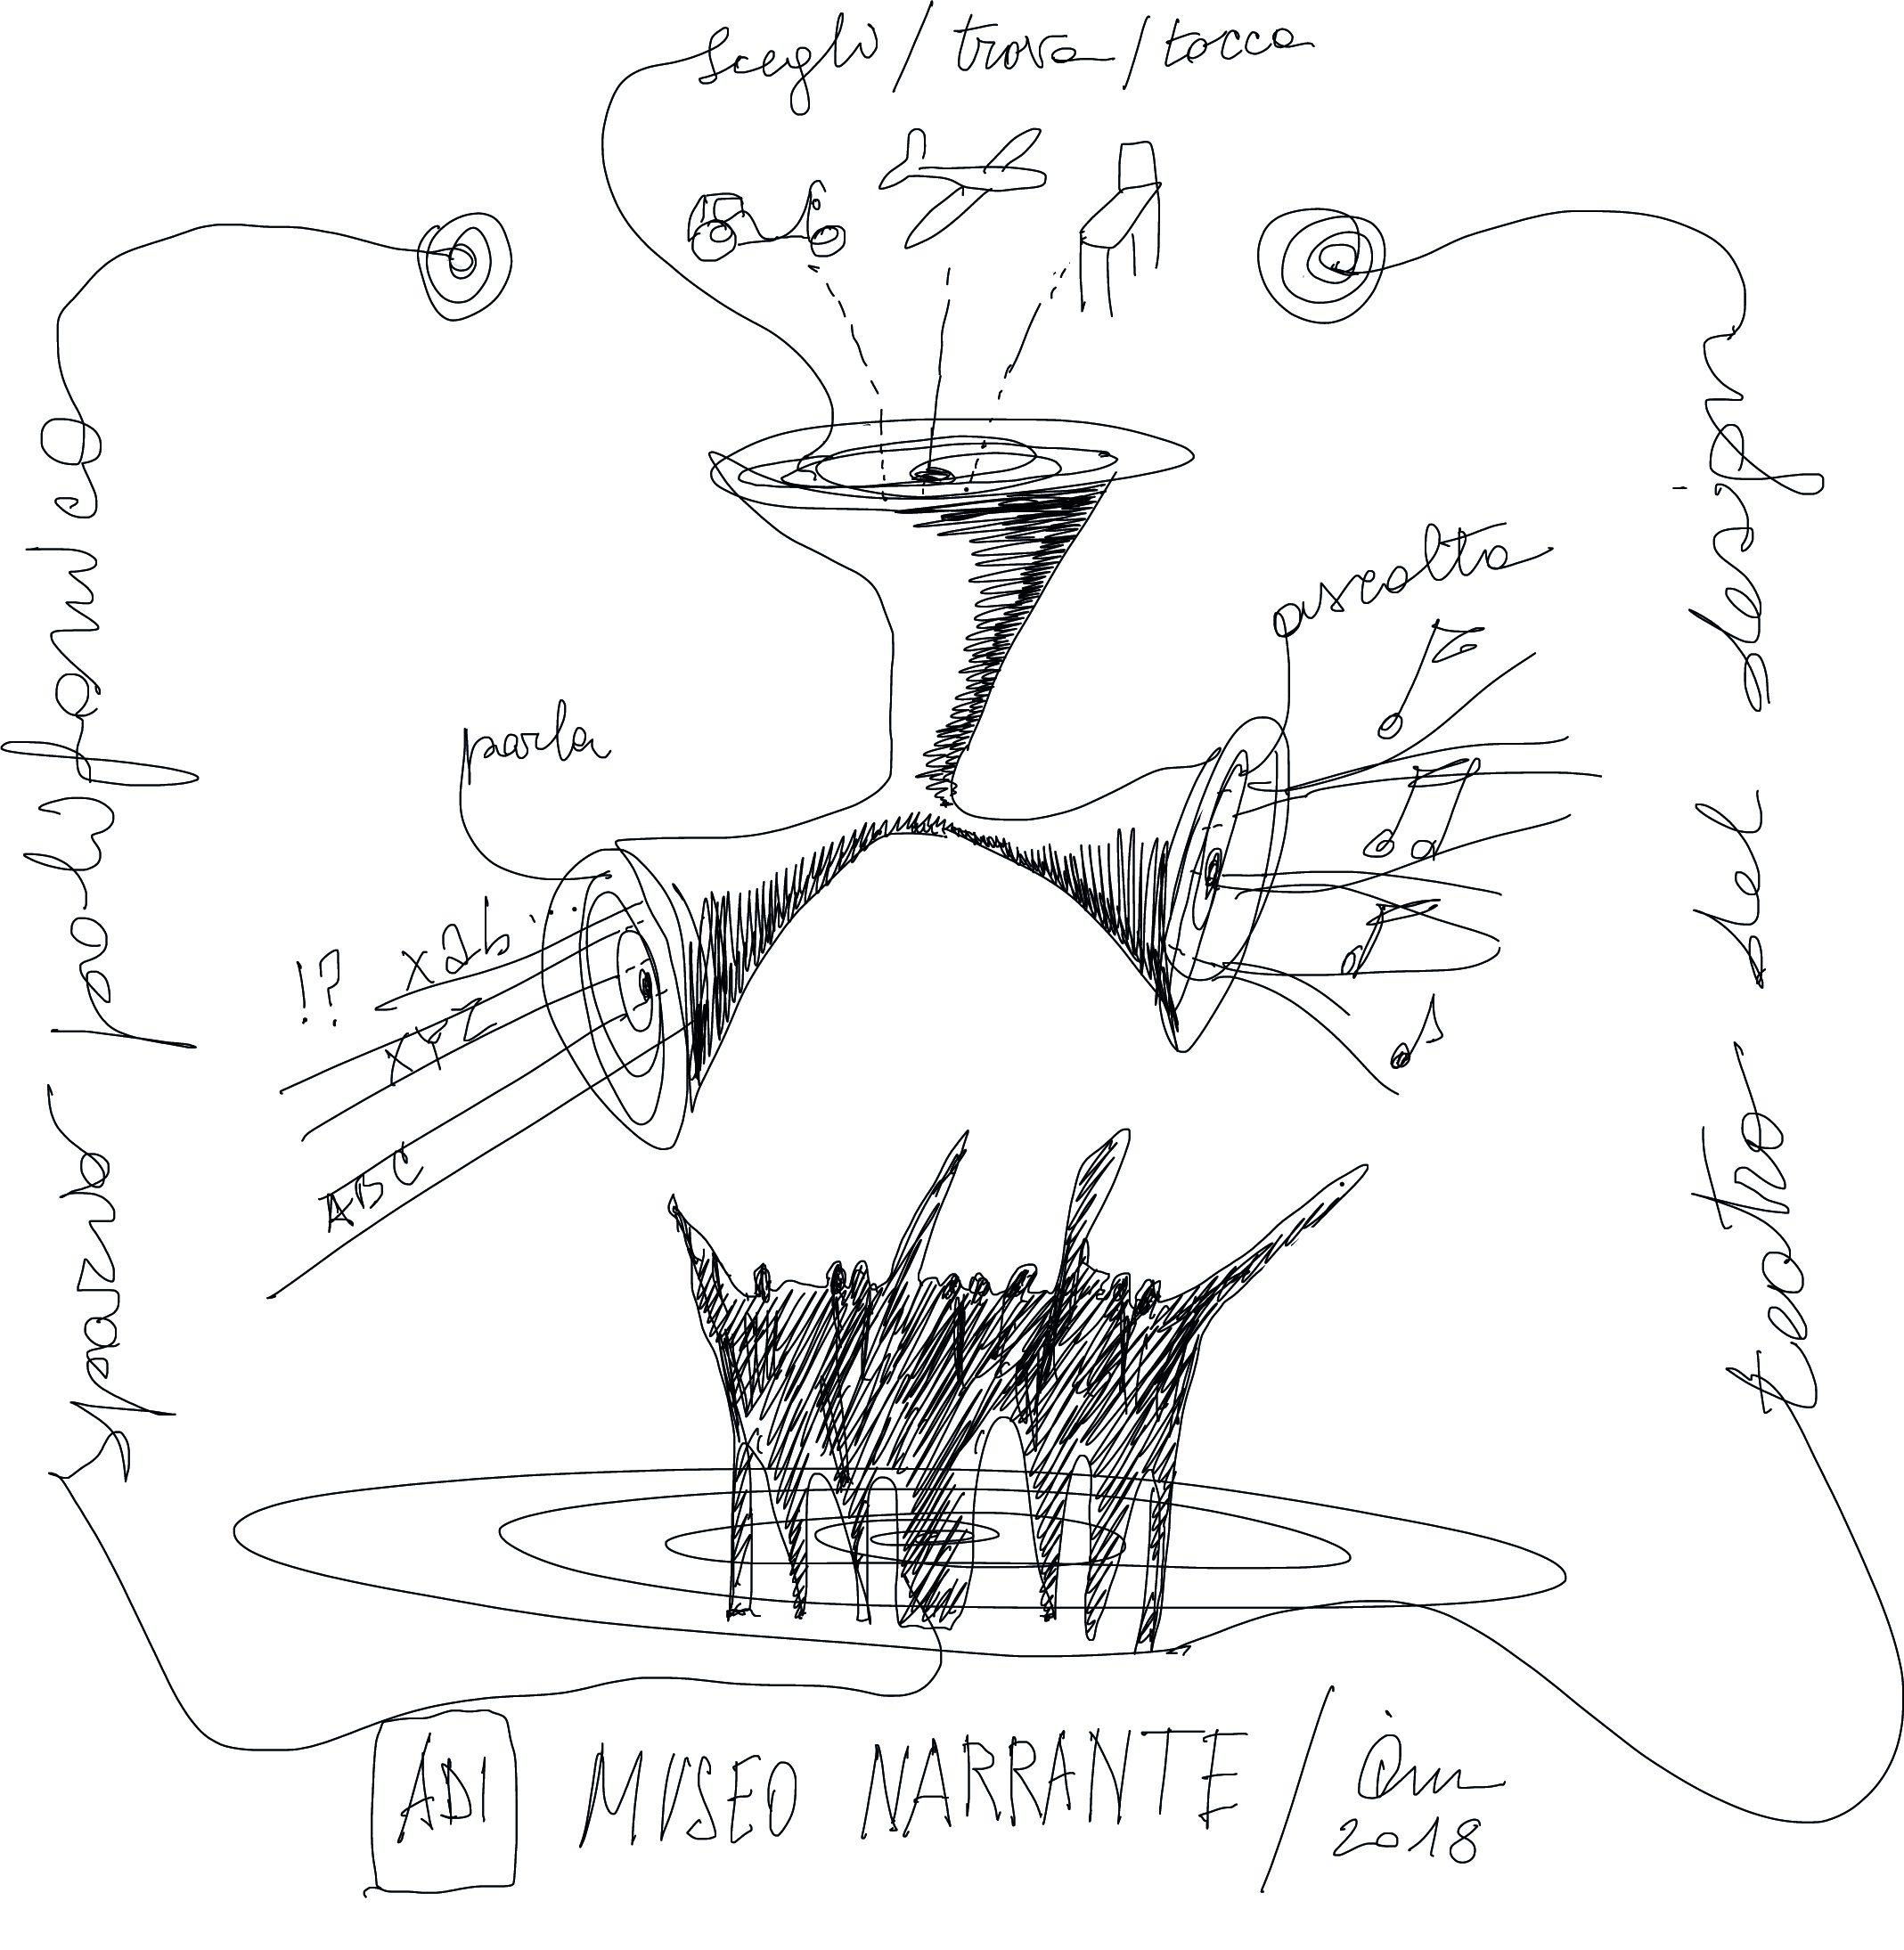 Sketch by Ico Migliore